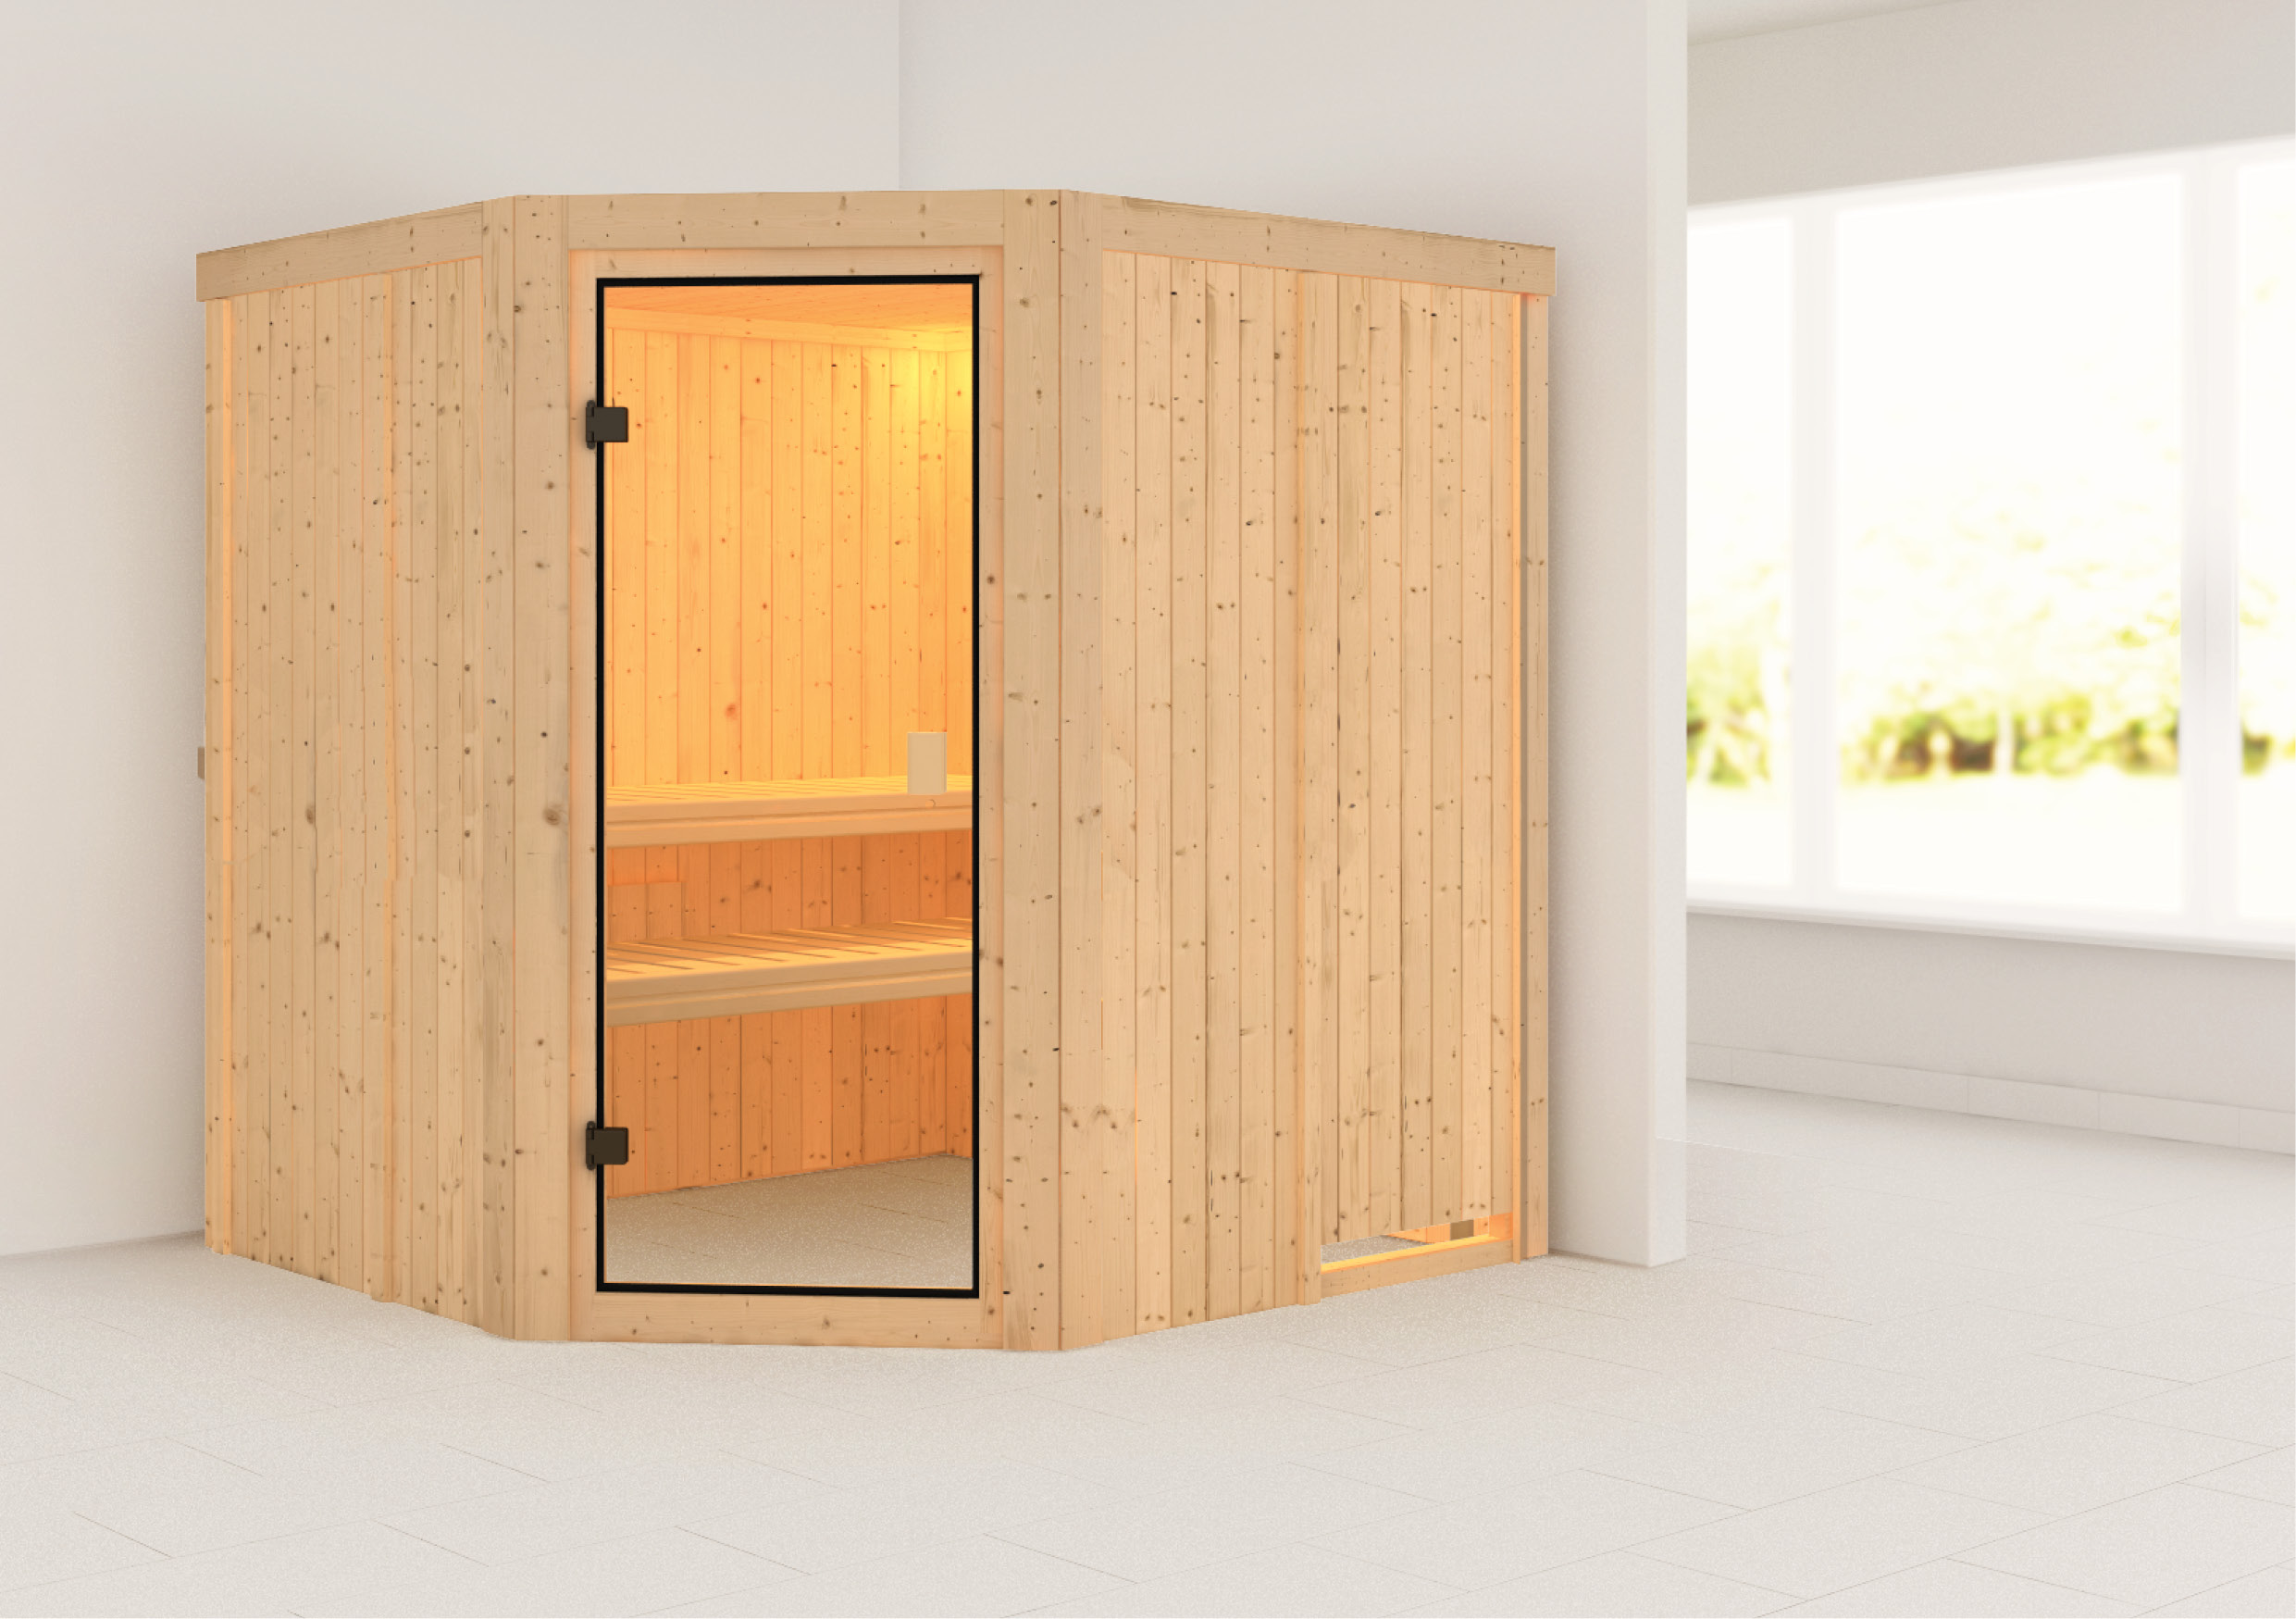 Woodfeeling Sauna Bodo 68mm ohne Saunaofen Bild 1